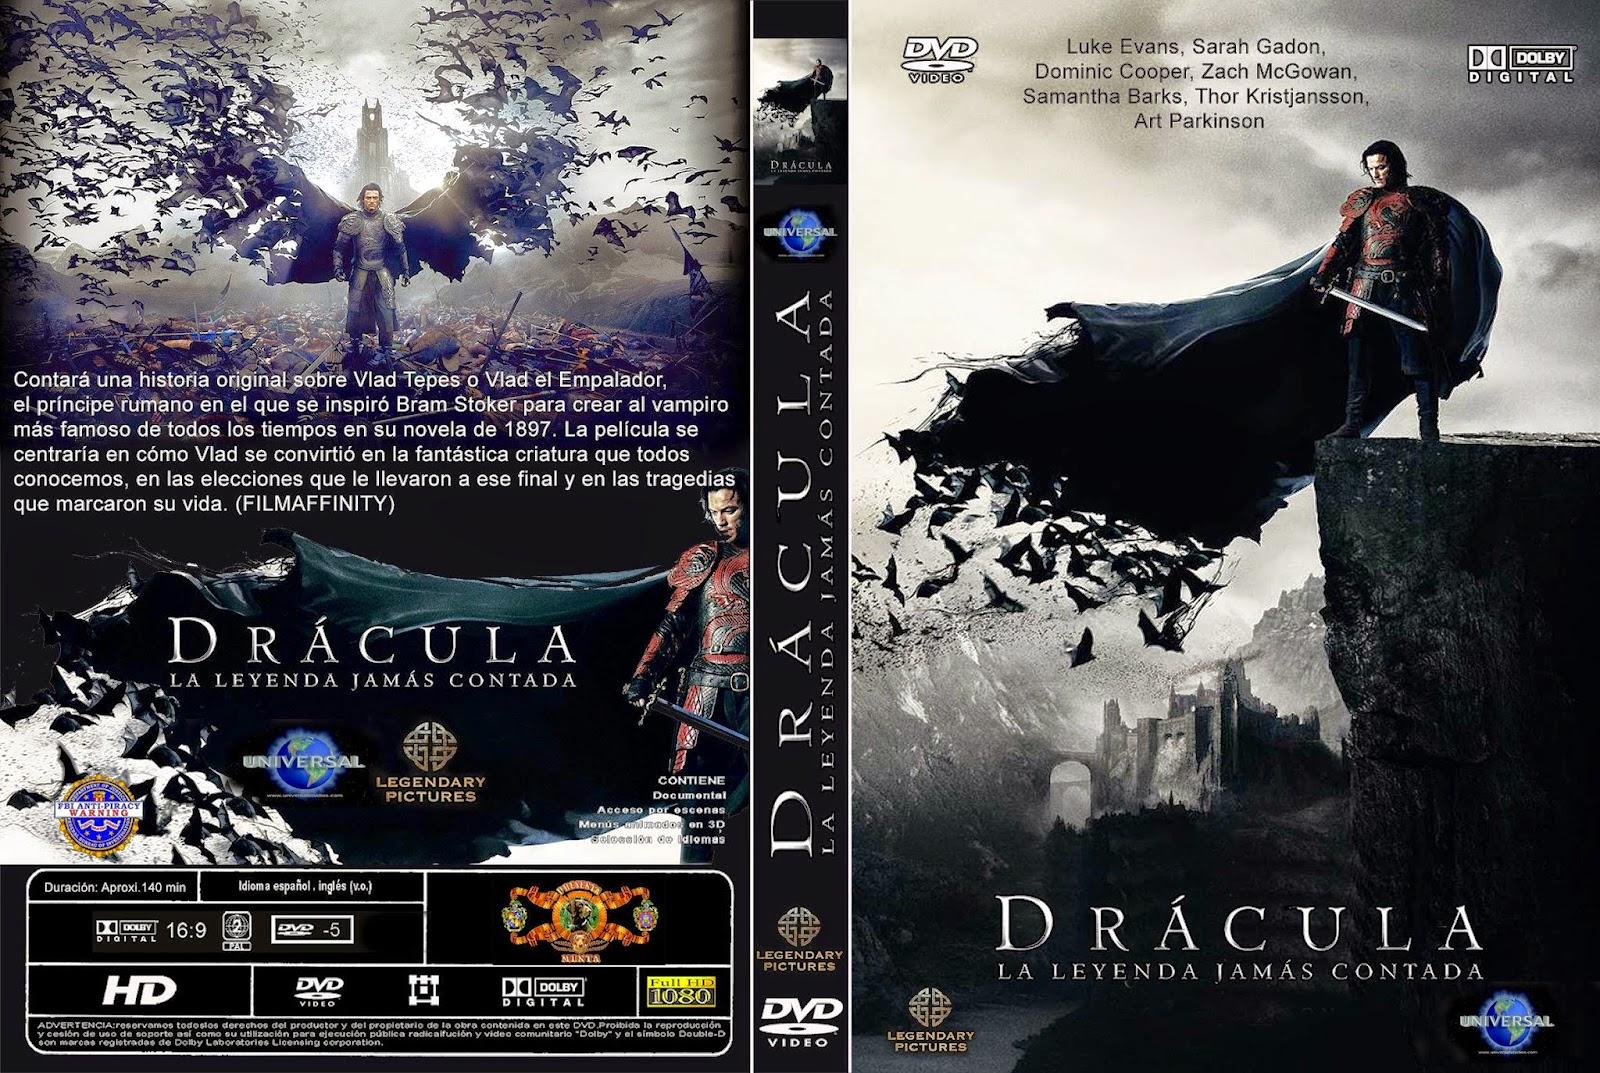 Dracula La Leyenda Jamas Contada DVD